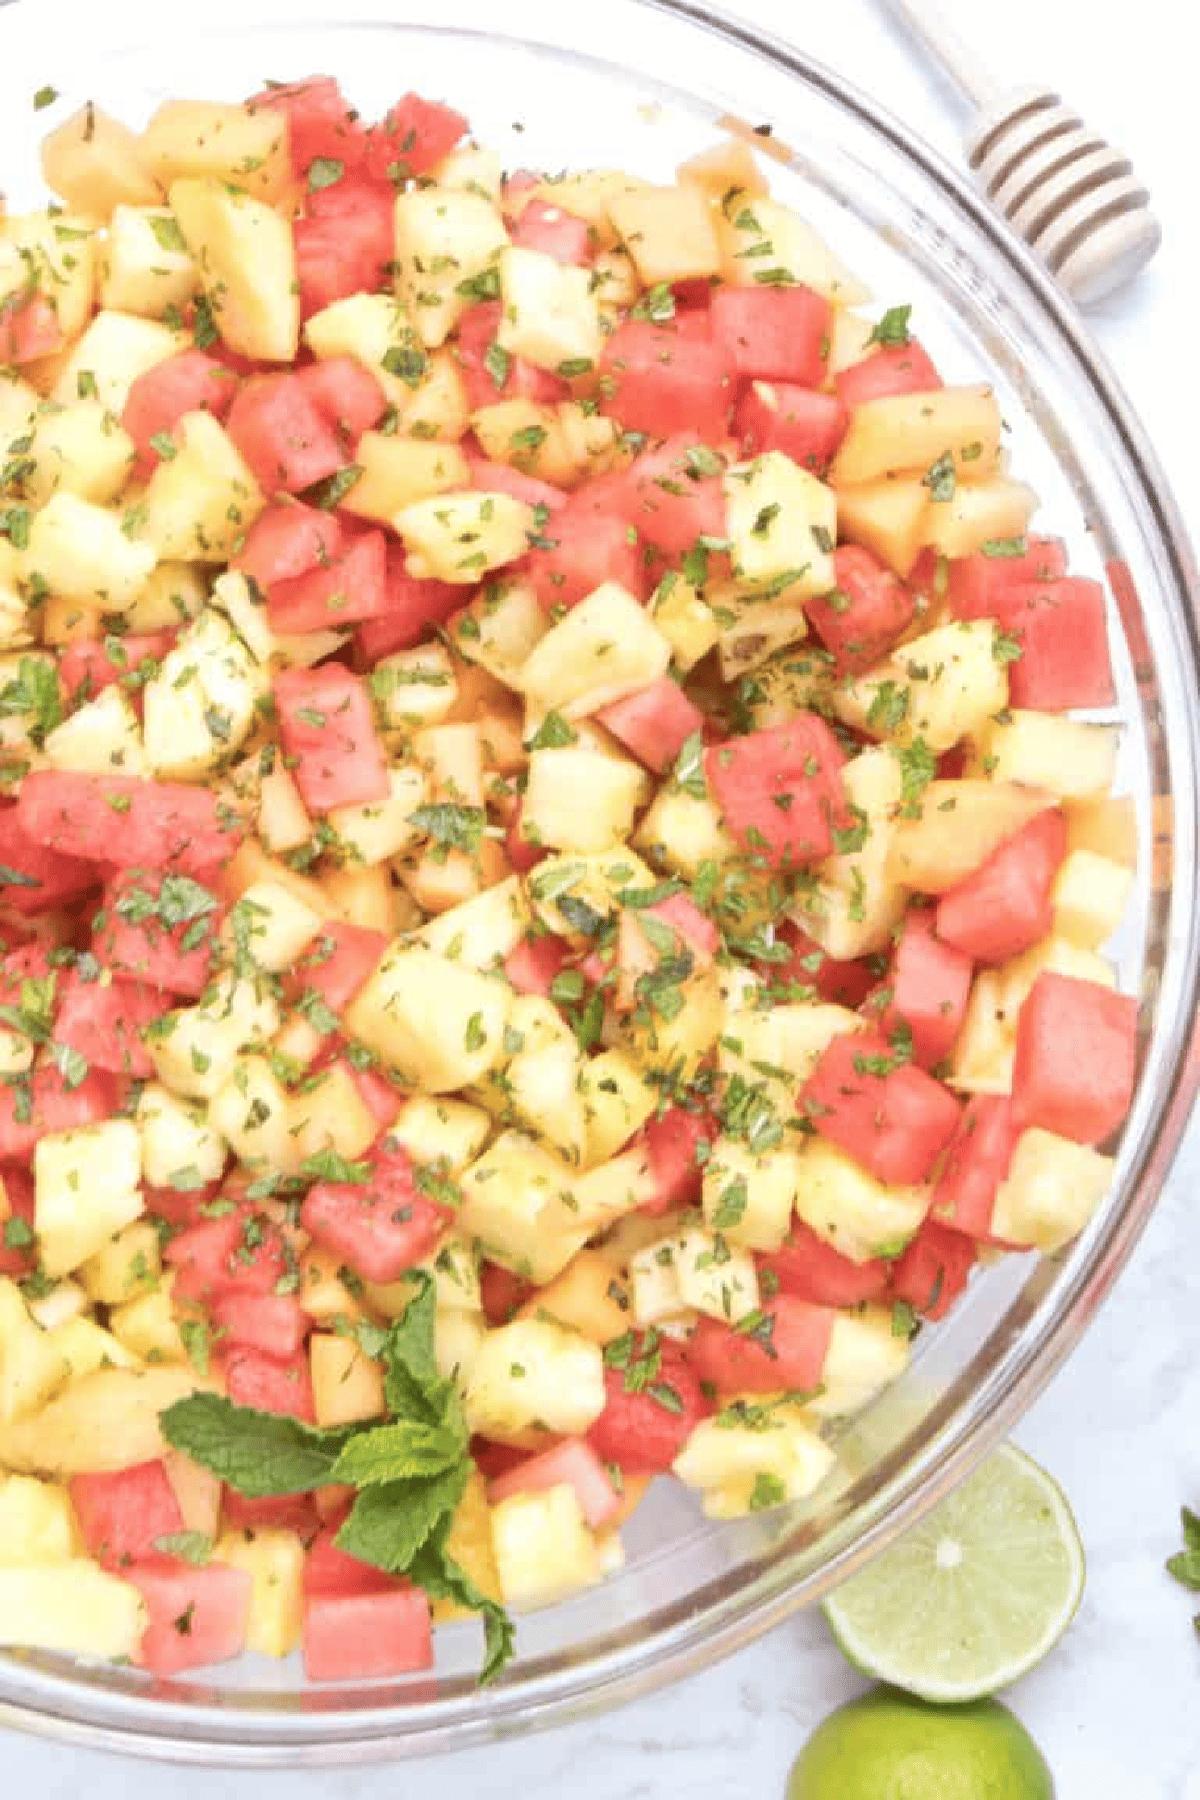 Cantaloupe, pineapple, melon, limes, mints, honey on a counter.